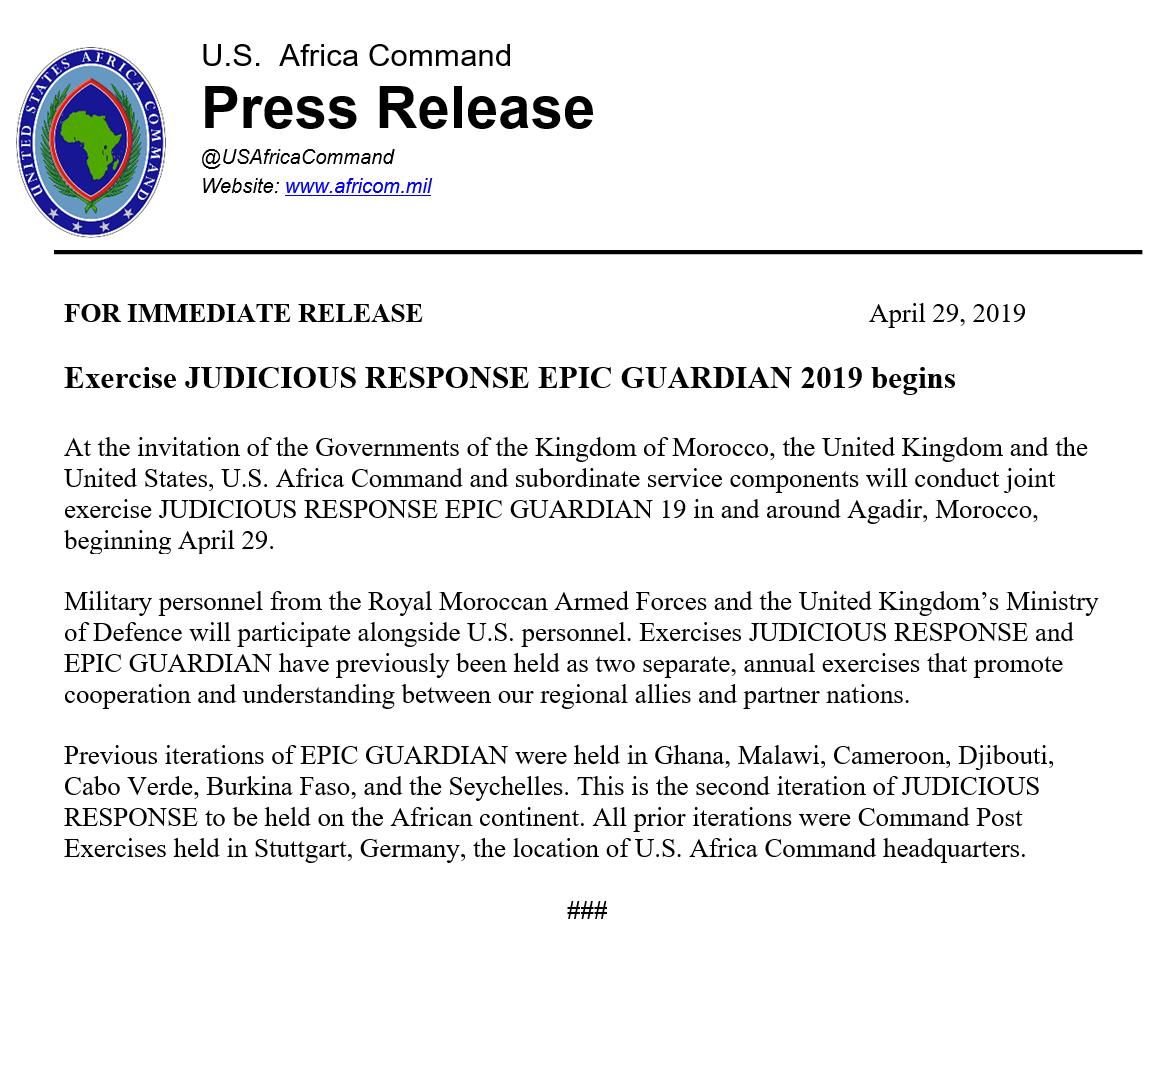 Exercice JUDICIOUS RESPONSE EPIC GUERDIAN 2019 D5U7TbvW4AETYGf